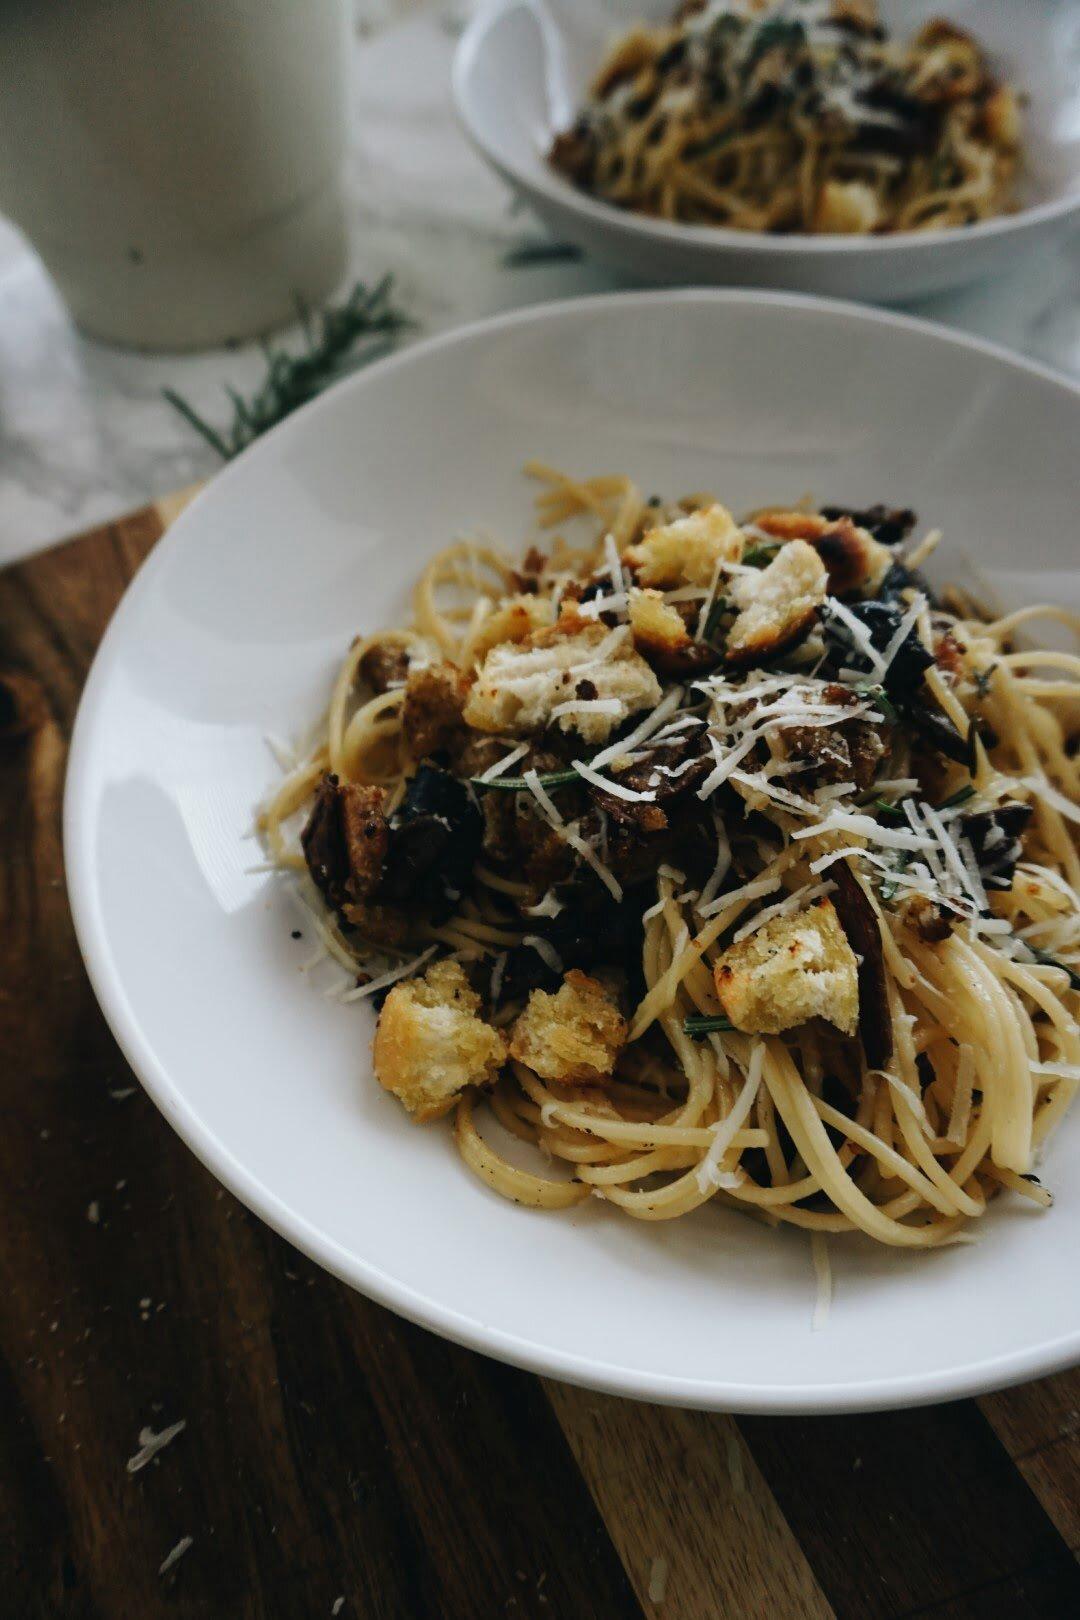 Makaron z borowikami, pecorino i grzankami 66